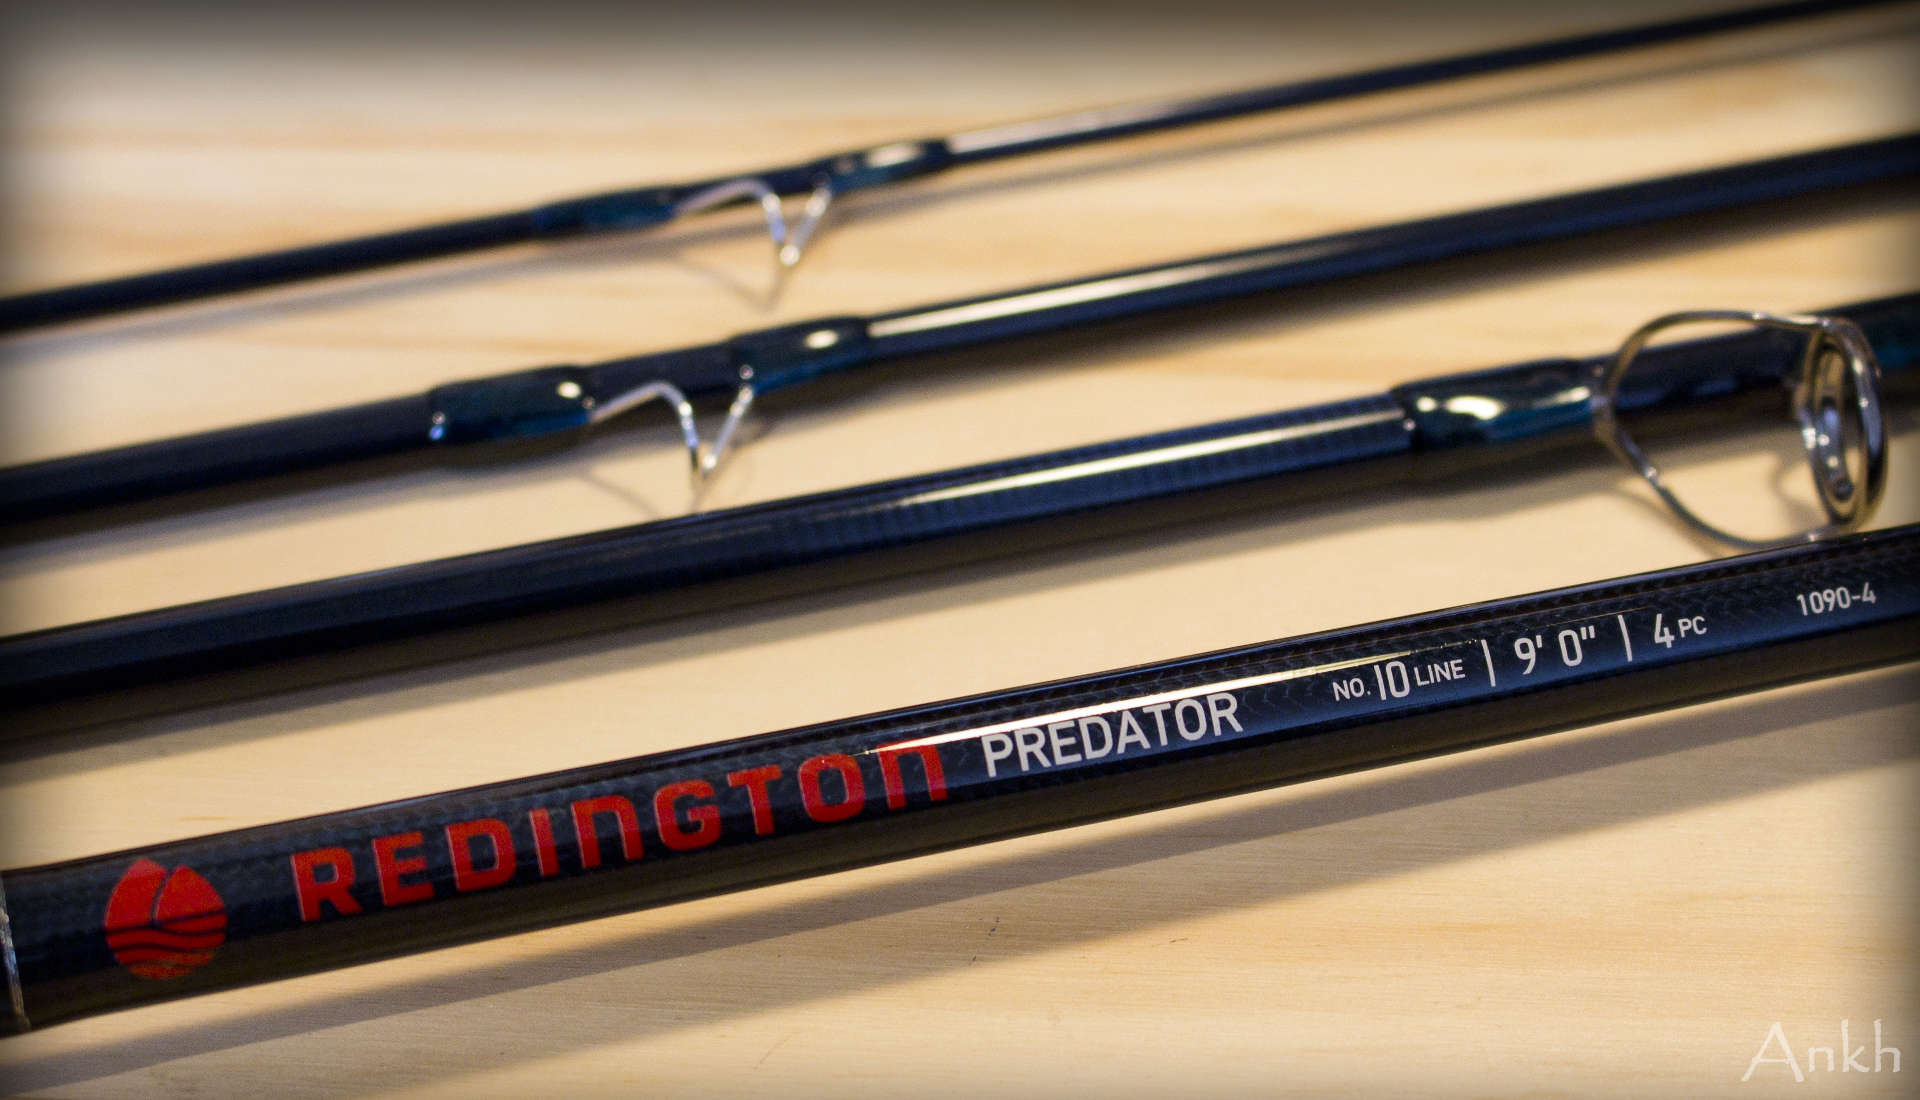 Redington Predator + Allen Kraken soie de 10 (mouche) 01_310